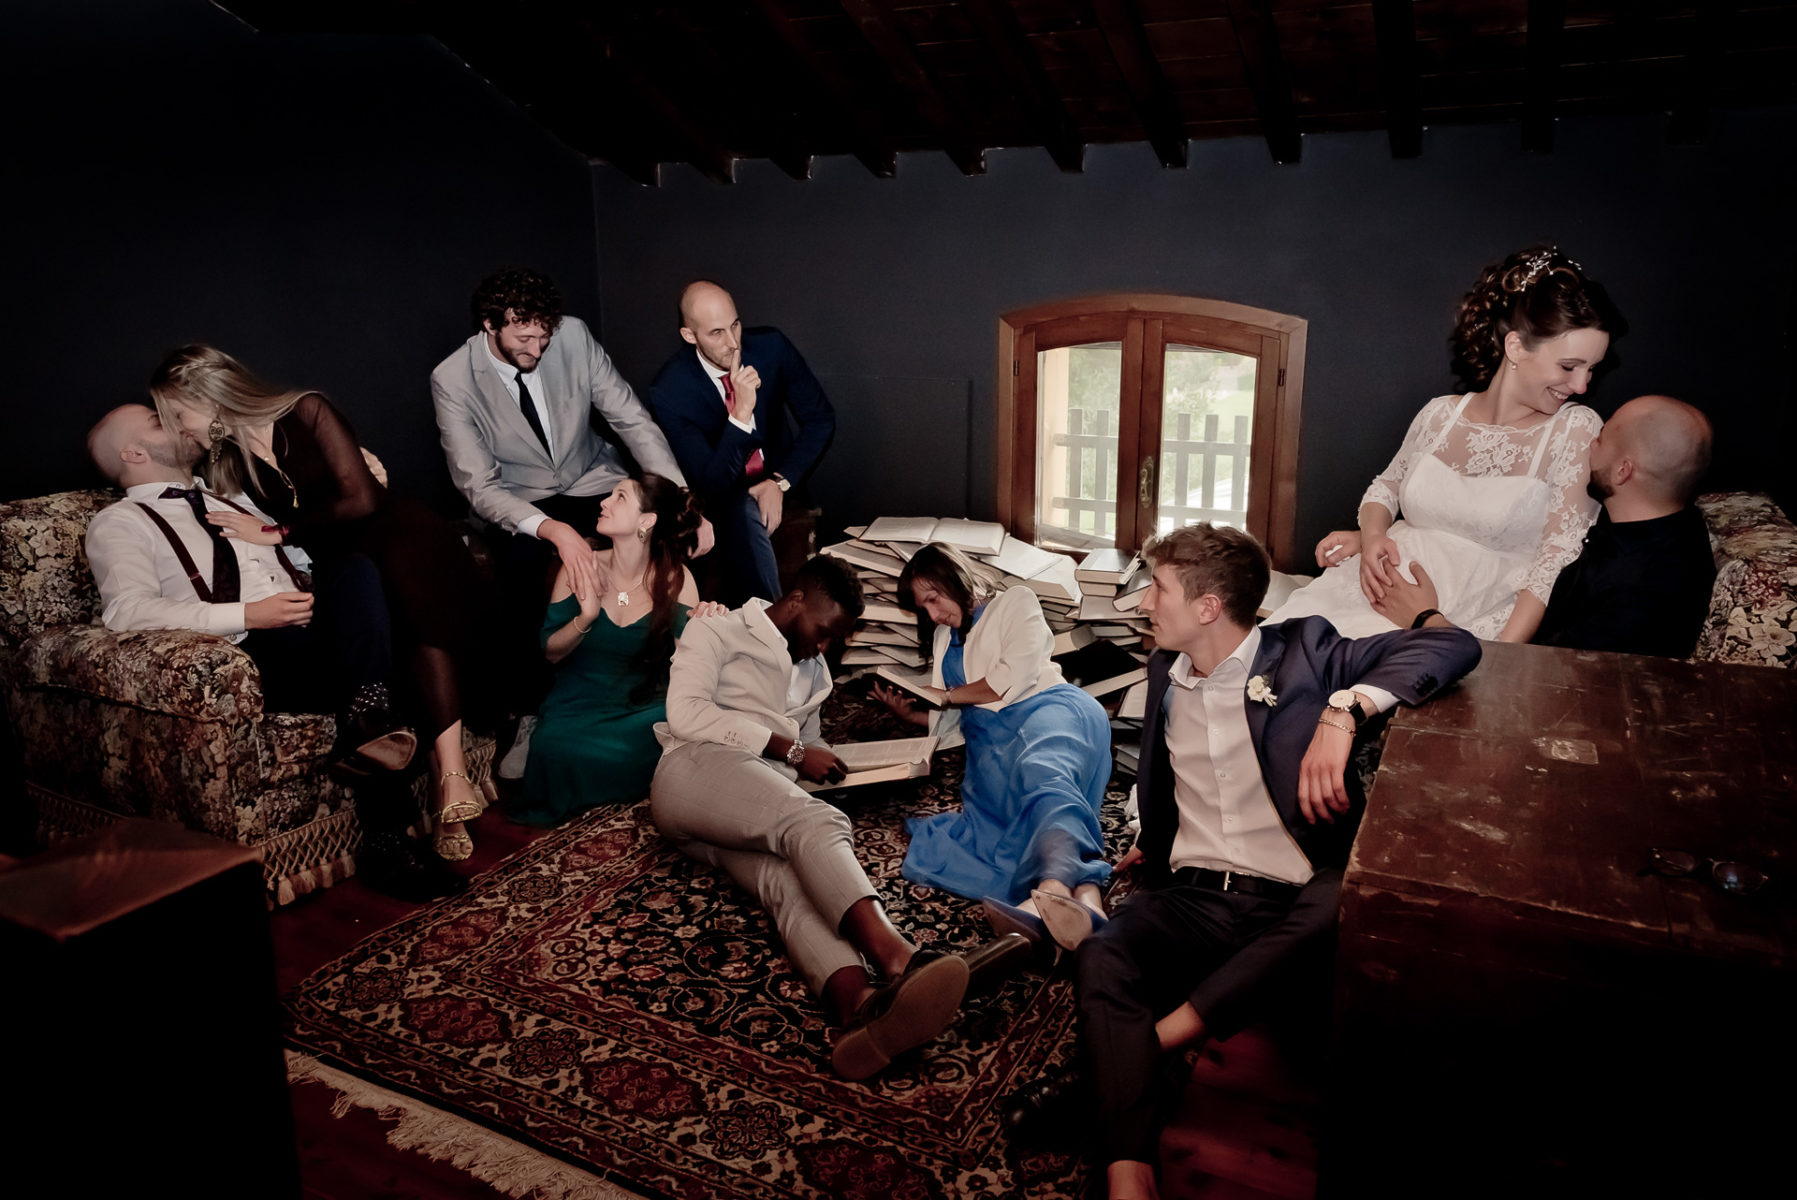 Fotografo per matrimoni padova treviso